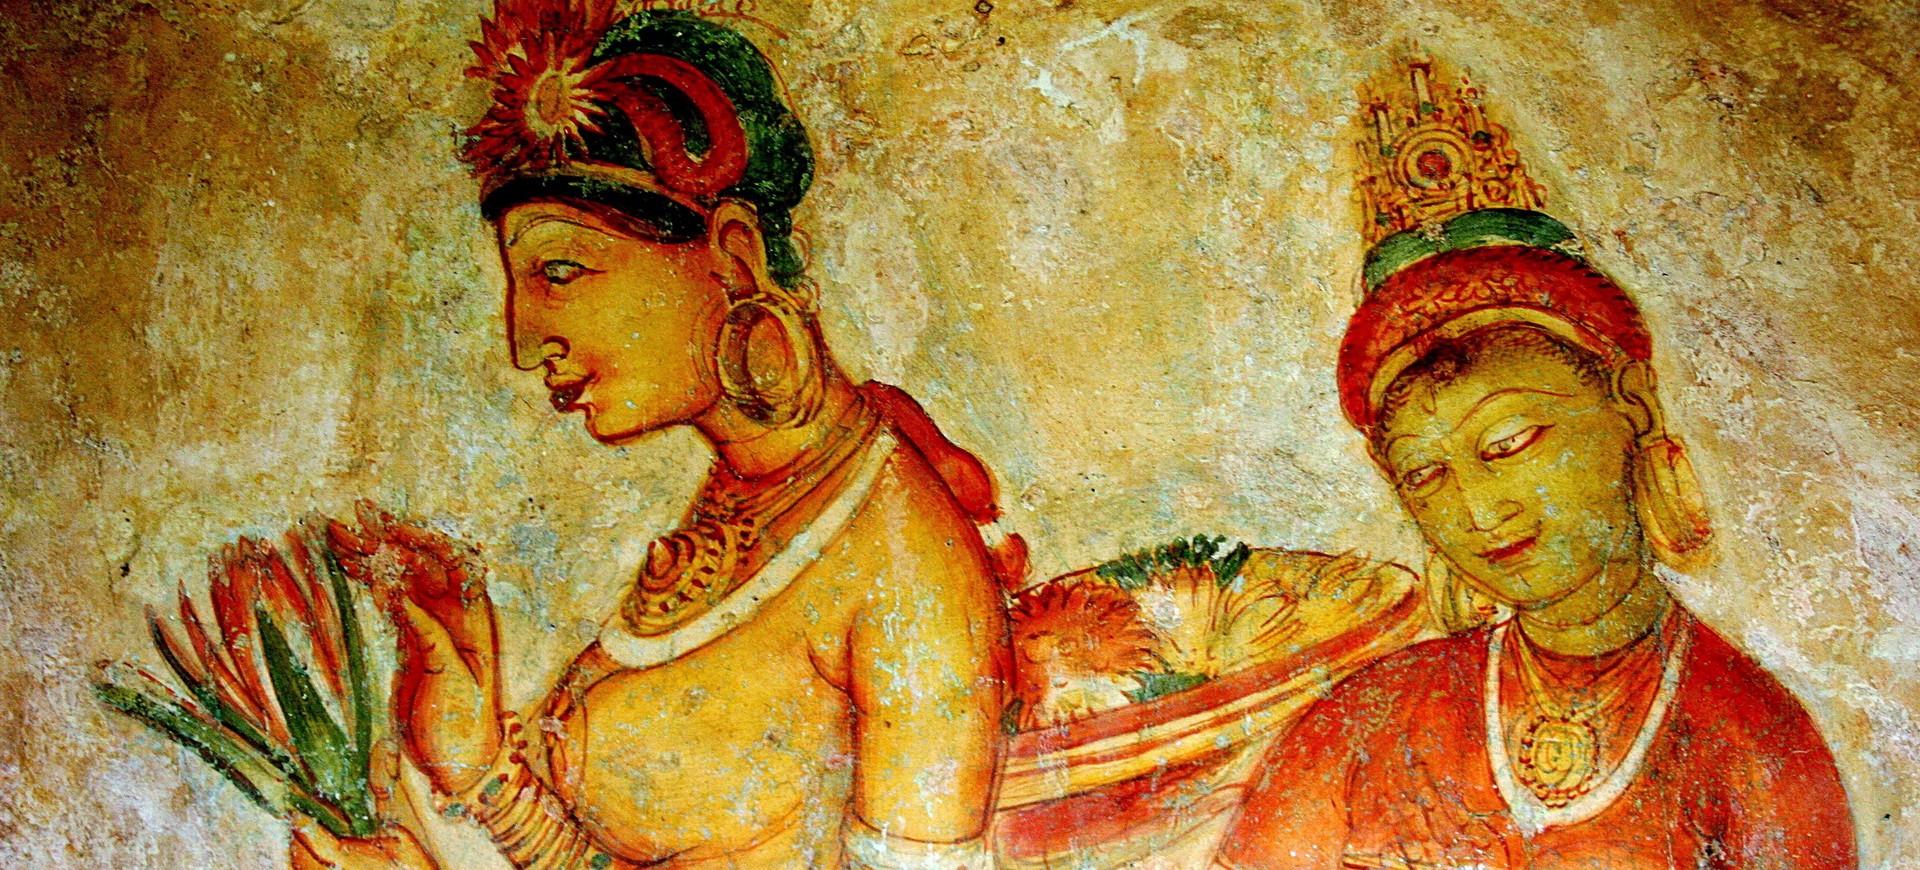 Sri Lanka Sigiriya Les fresques de Demoiselles de Sigiriya